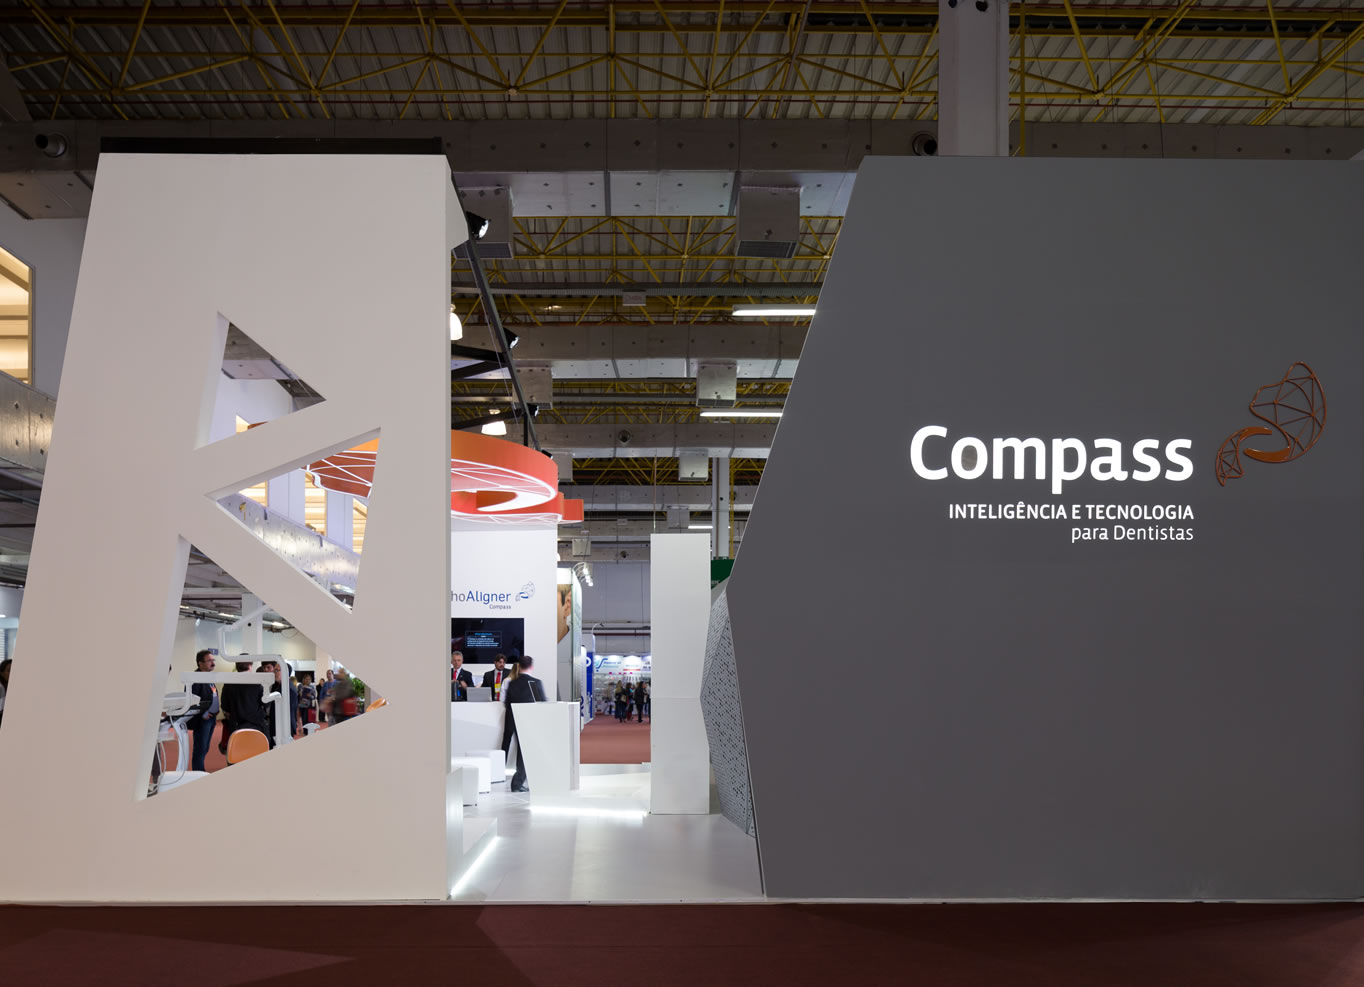 compass-04